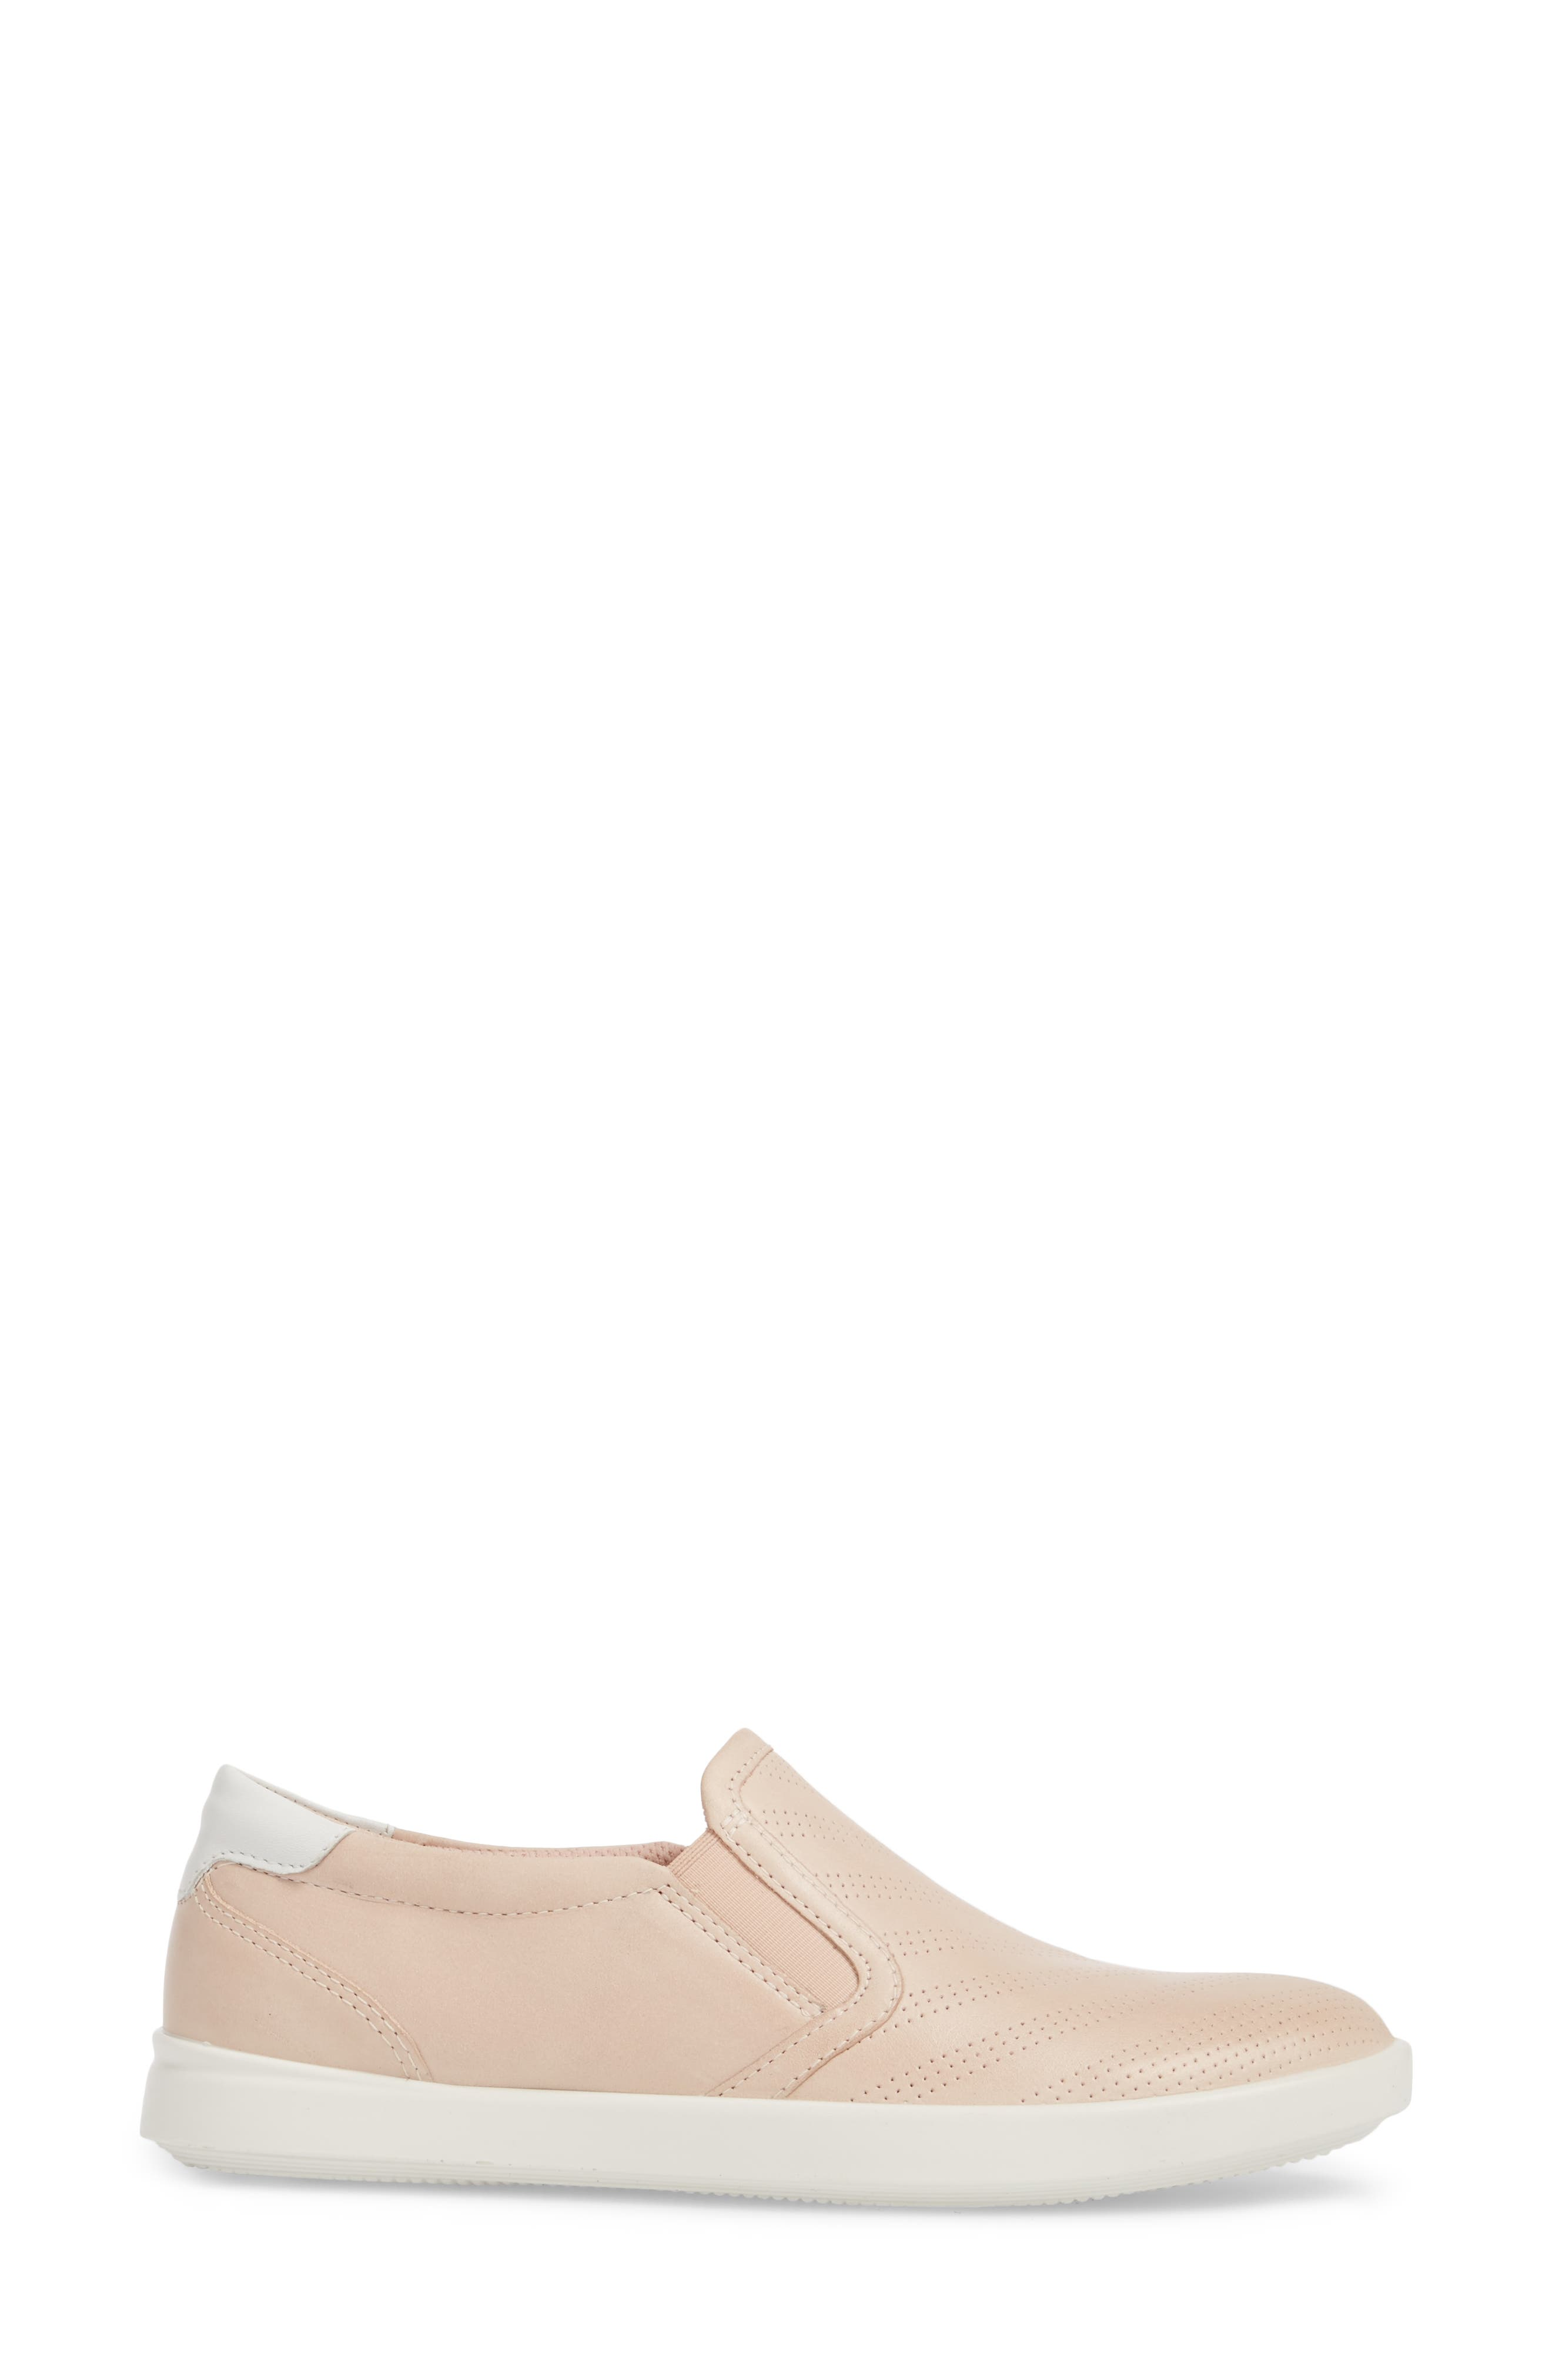 'Aimee' Slip-On Sneaker,                             Alternate thumbnail 3, color,                             Rose Dust Leather